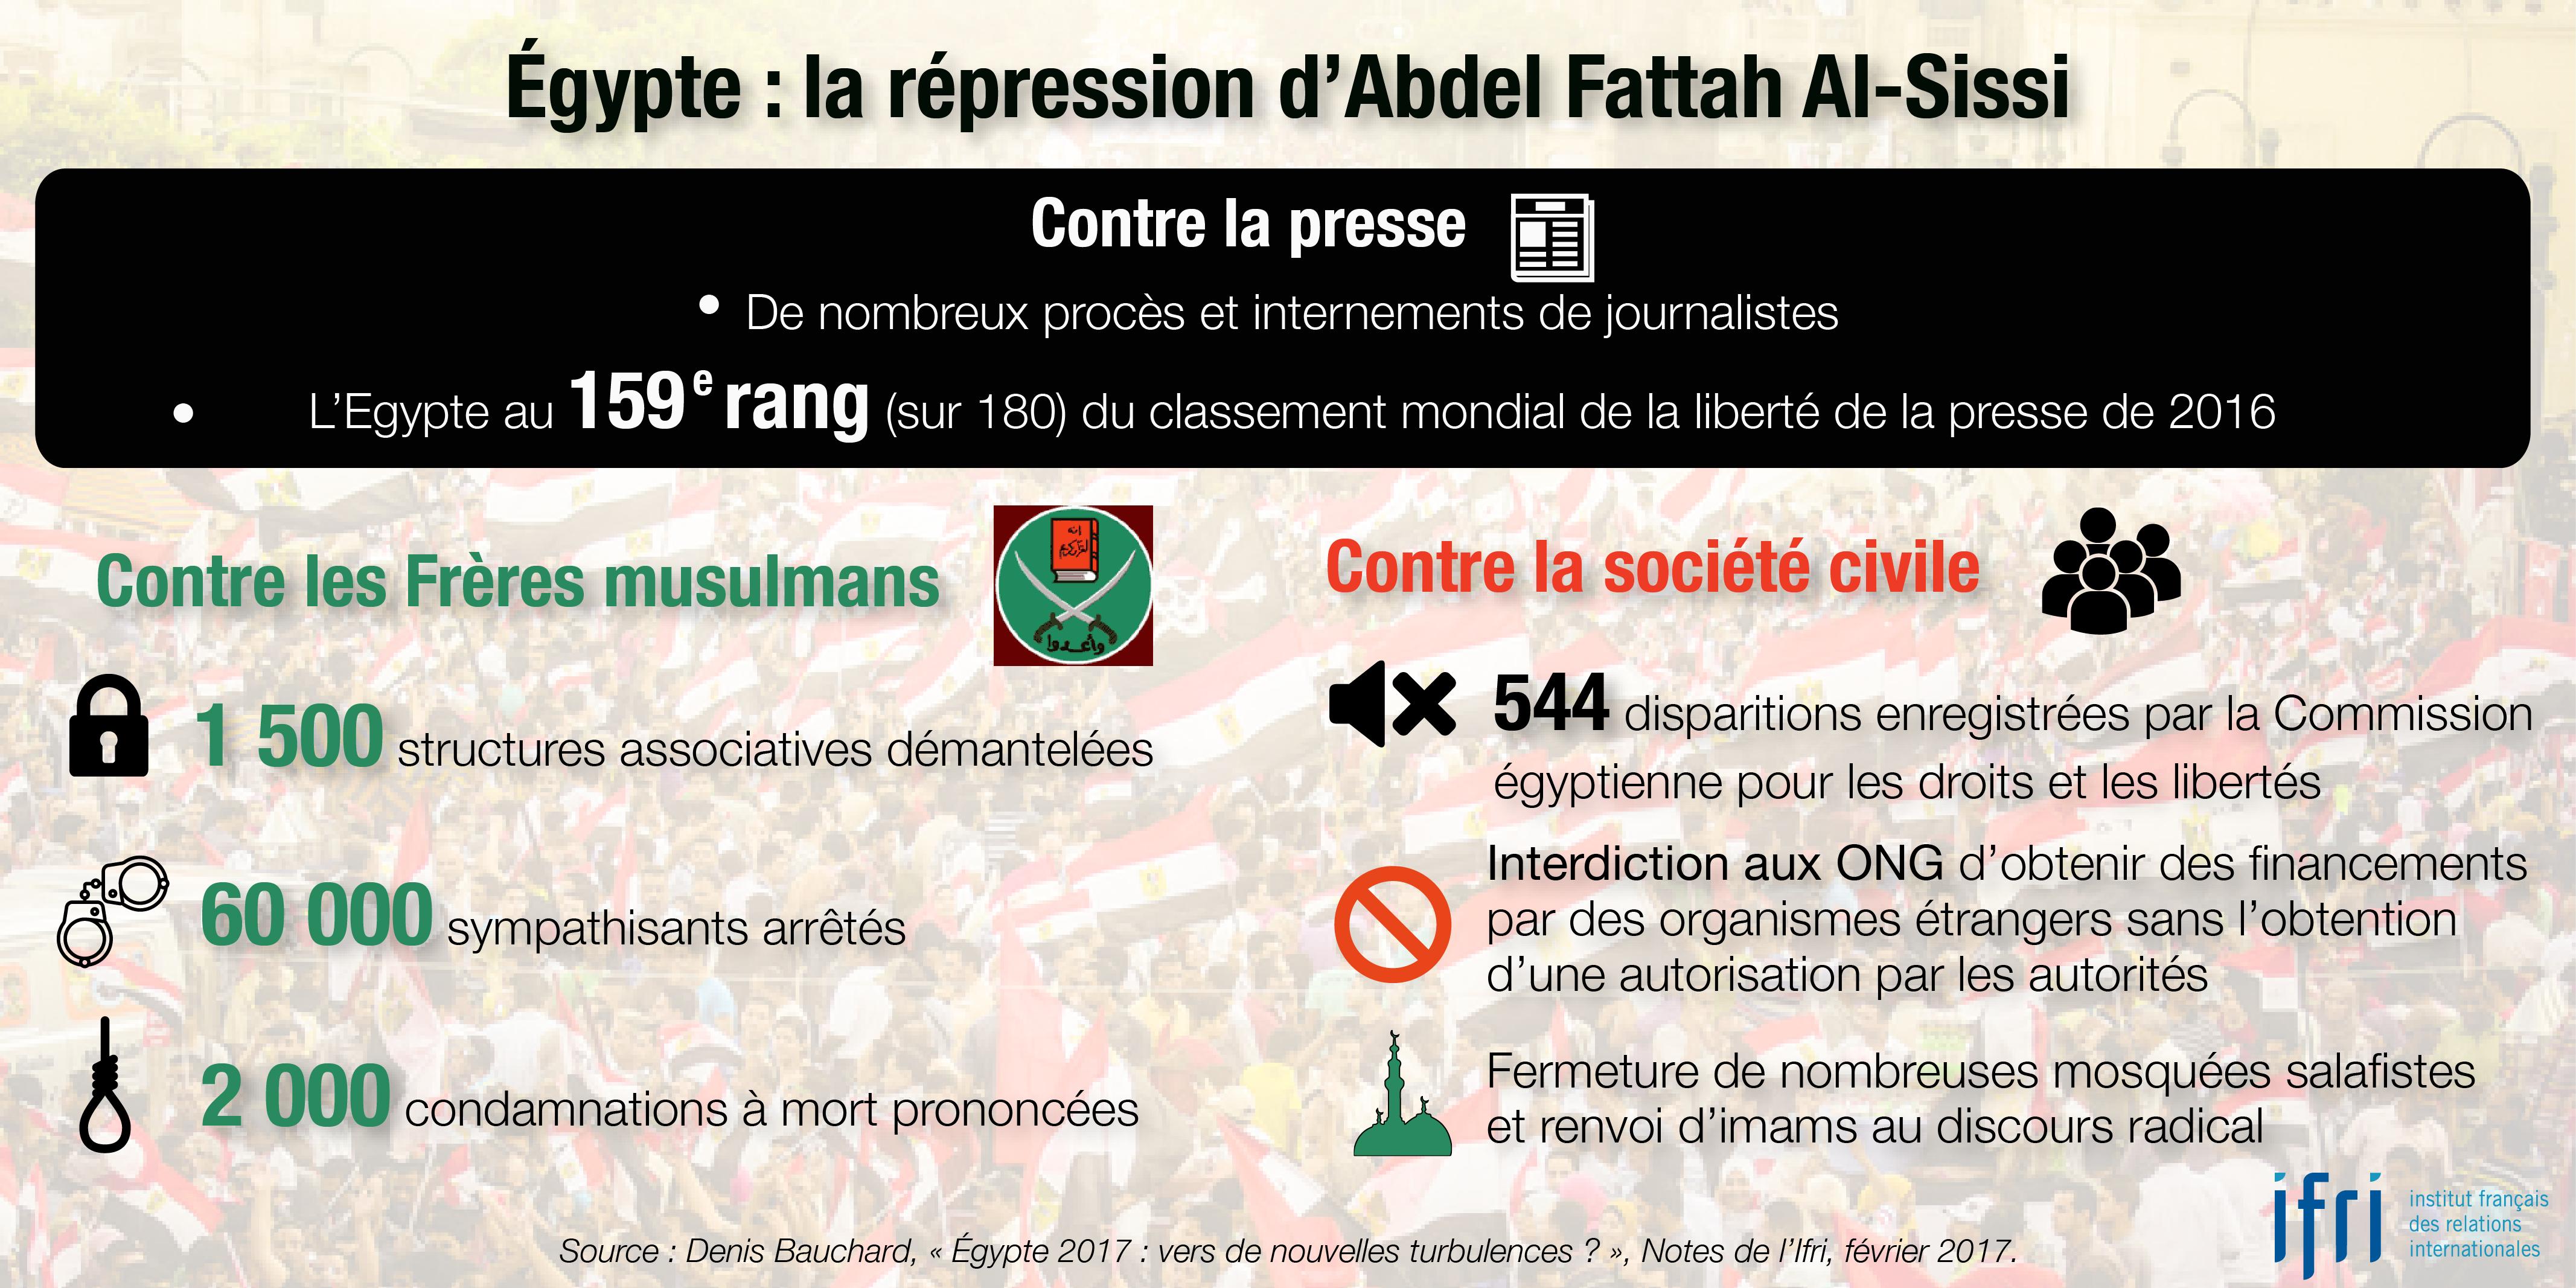 Egypte : la répression d'Abdel Fattah Al-Sissi